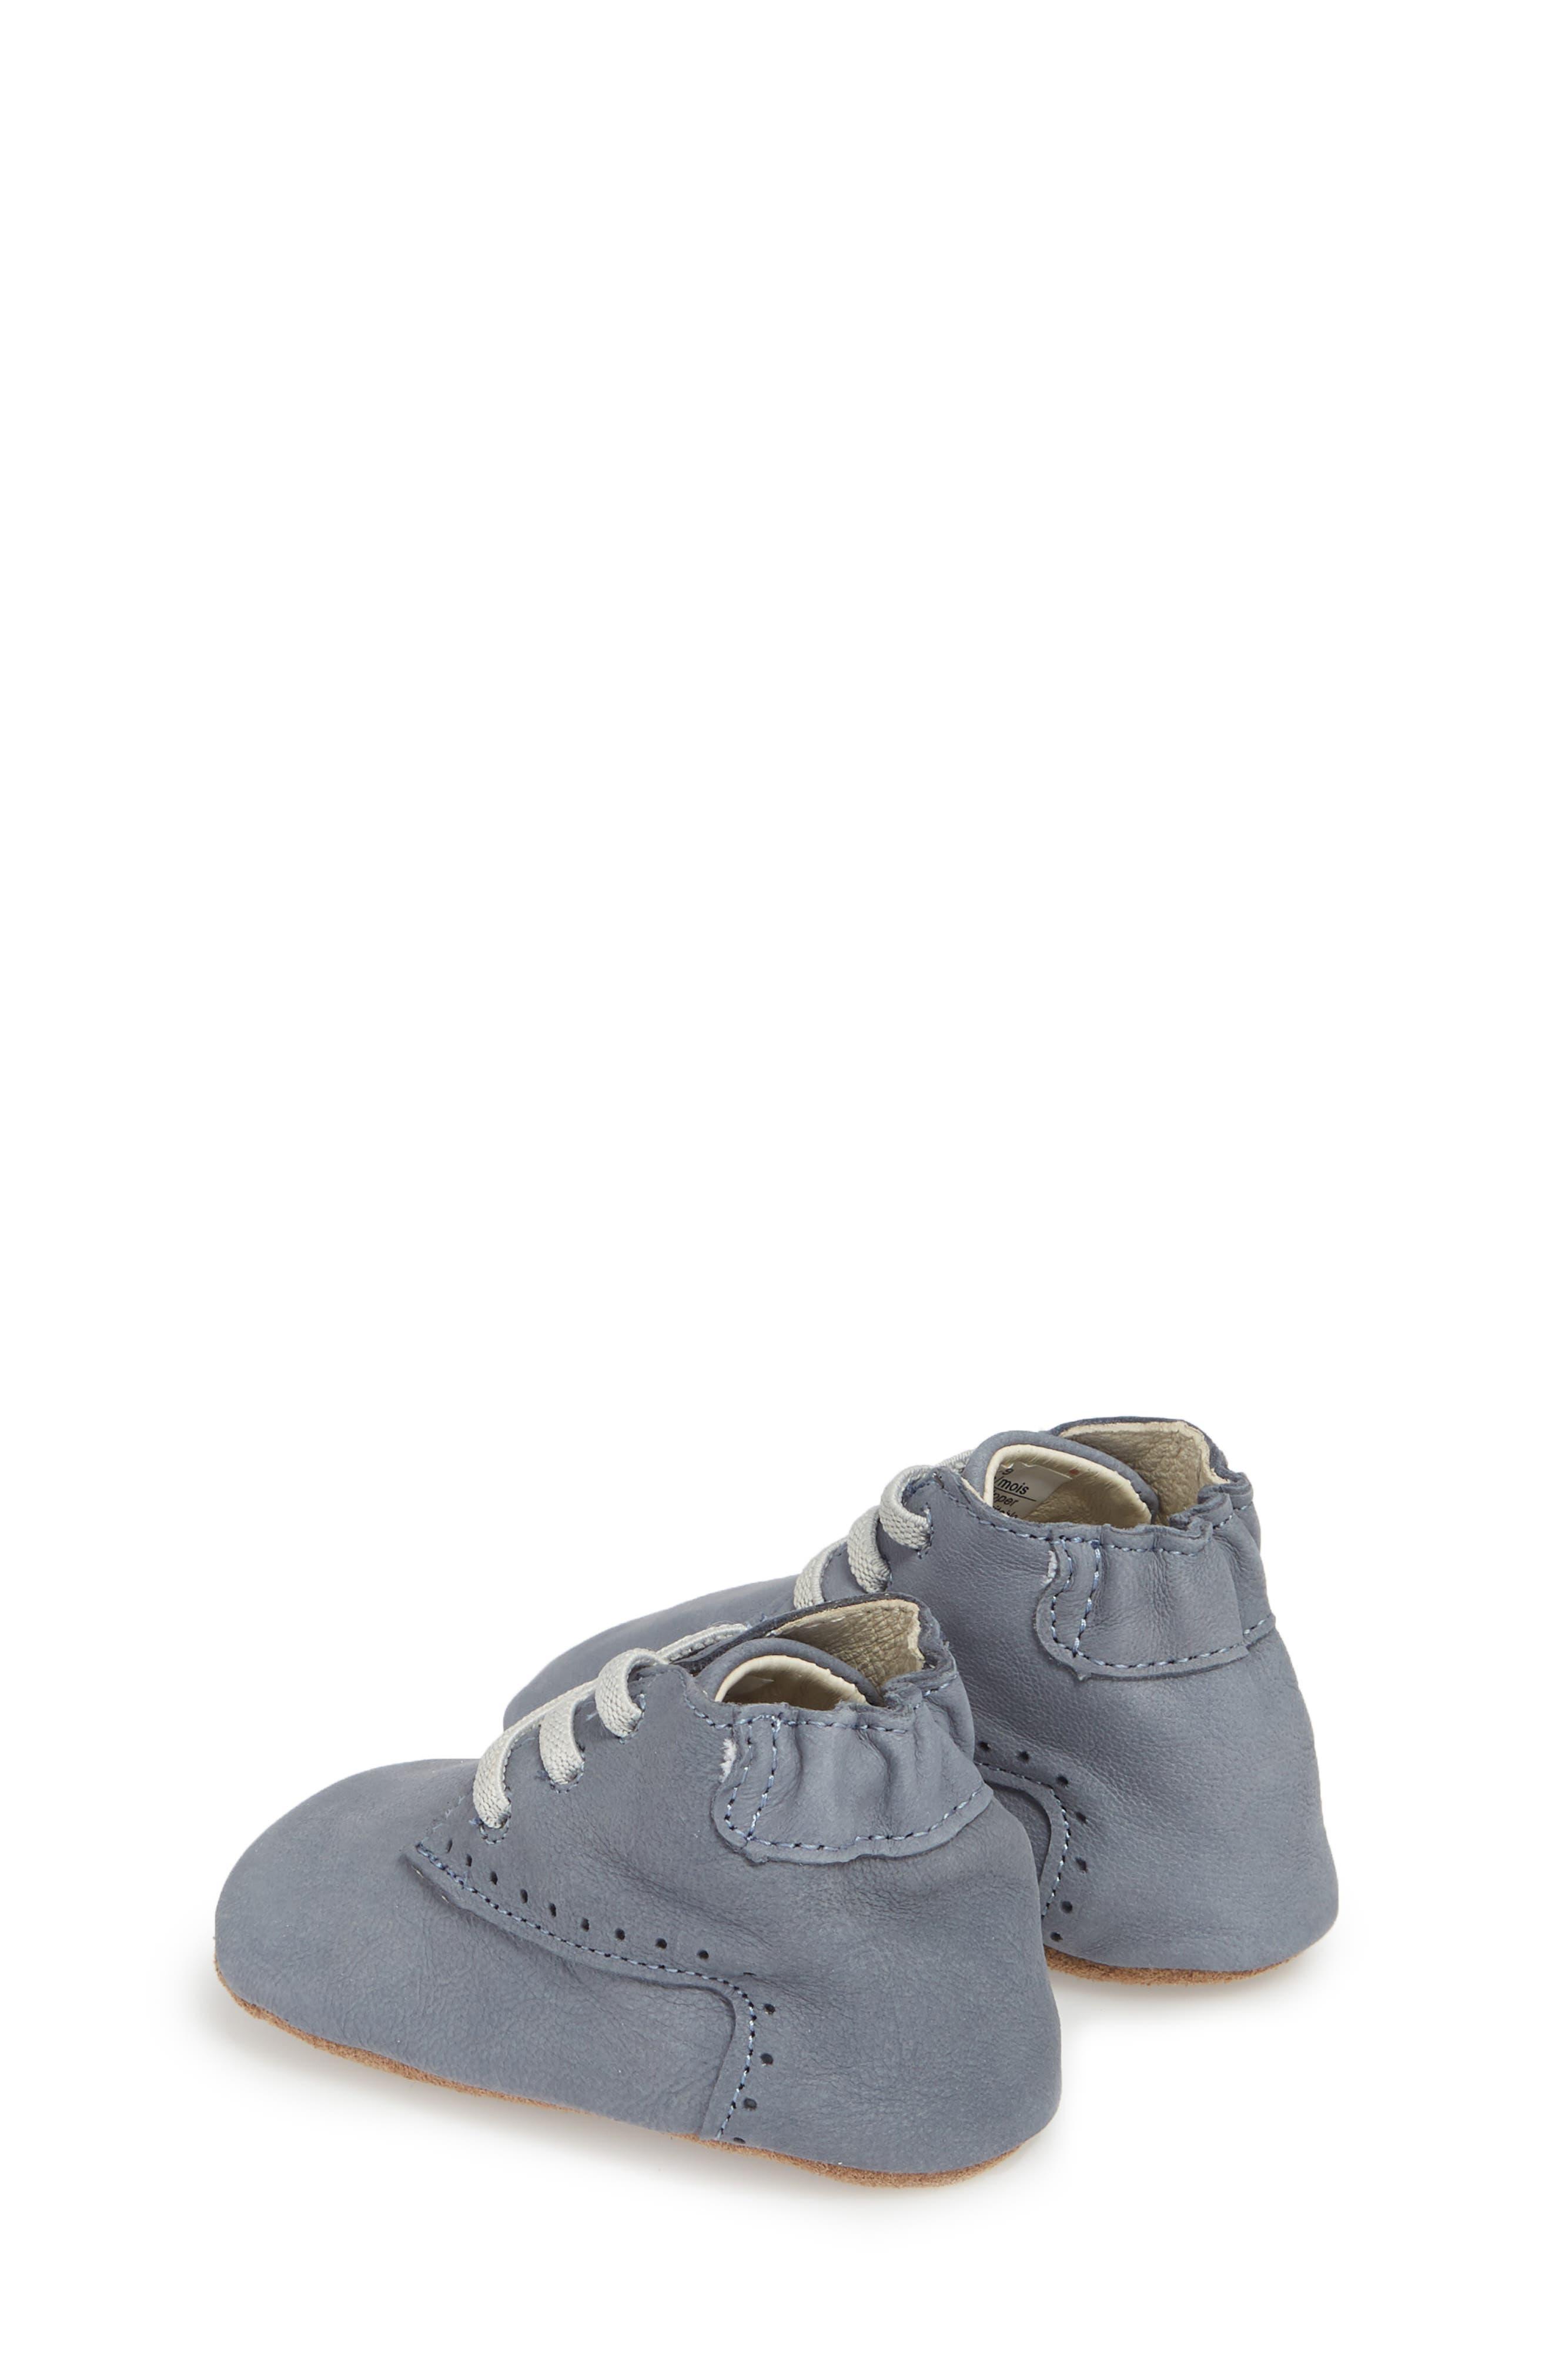 William Chukka Boot Crib Shoe,                             Alternate thumbnail 2, color,                             Blue